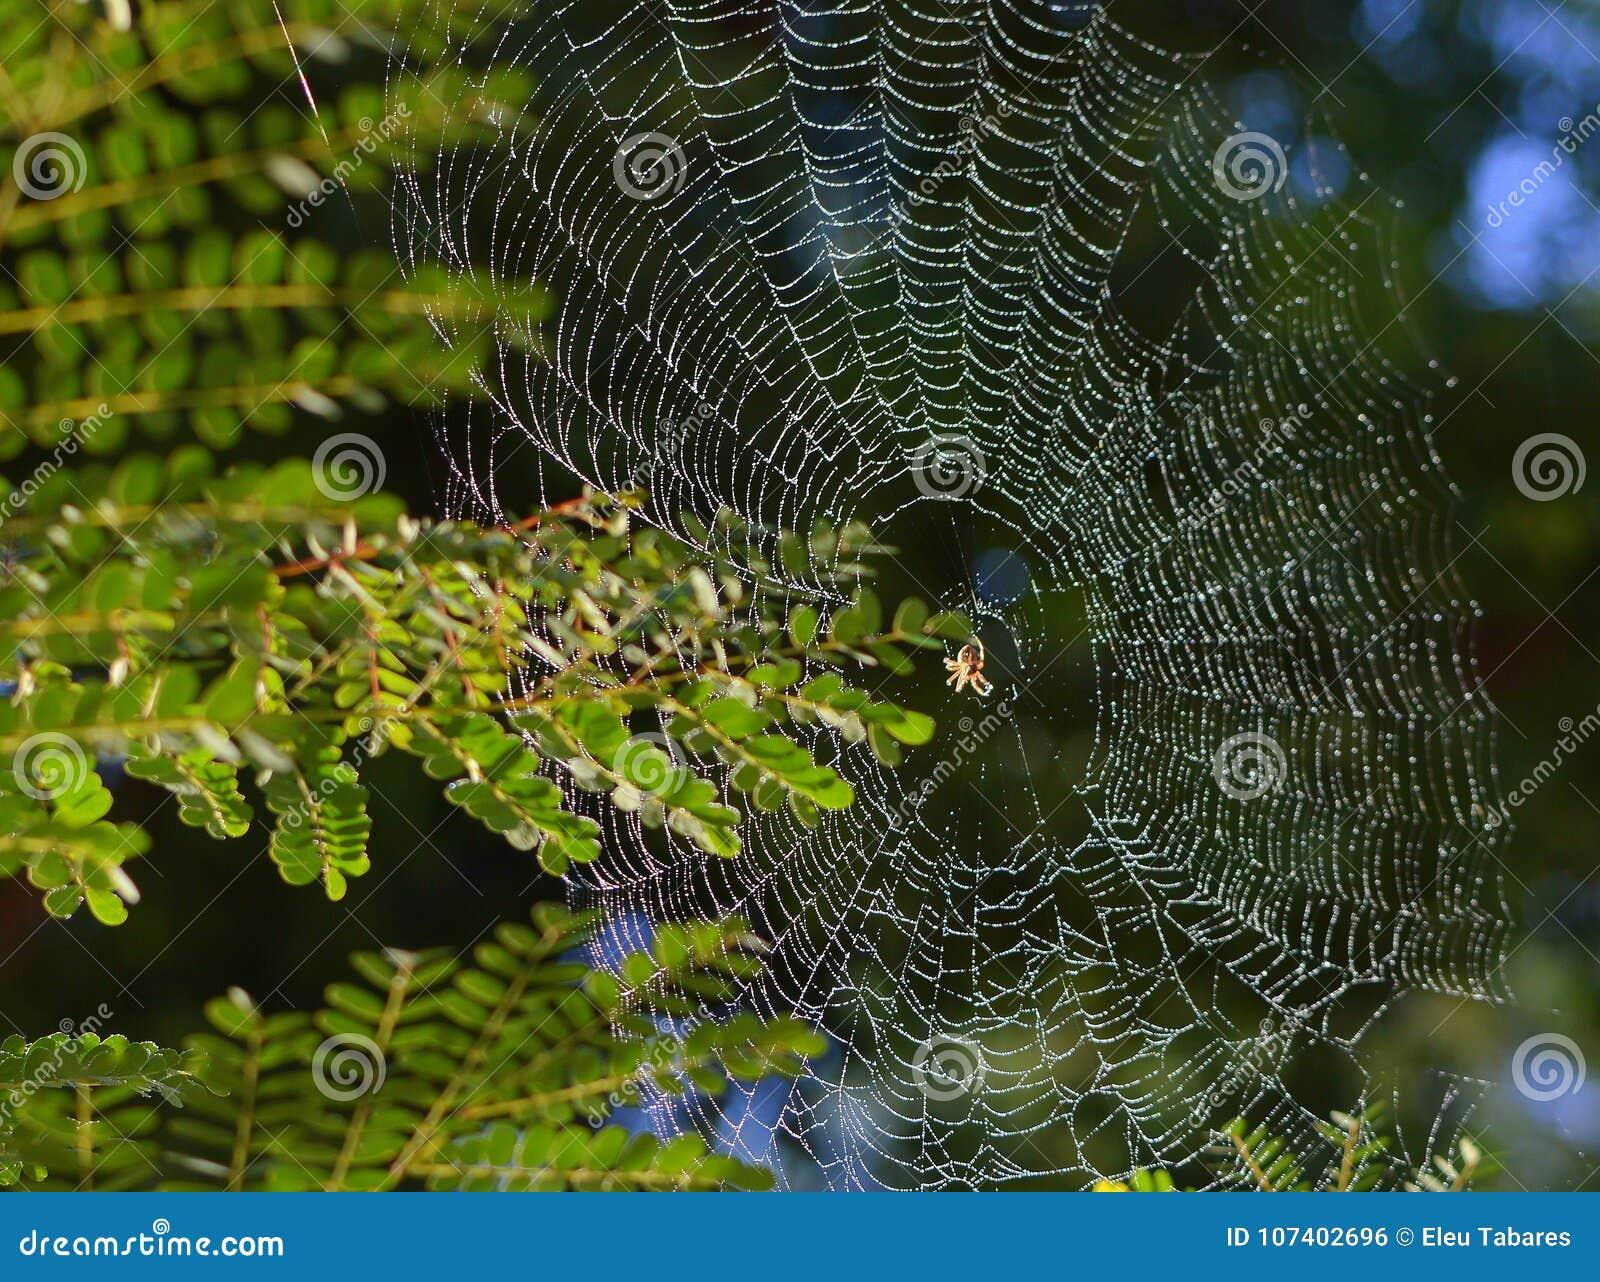 close up a spirder web stock photo image of mantis 107402696